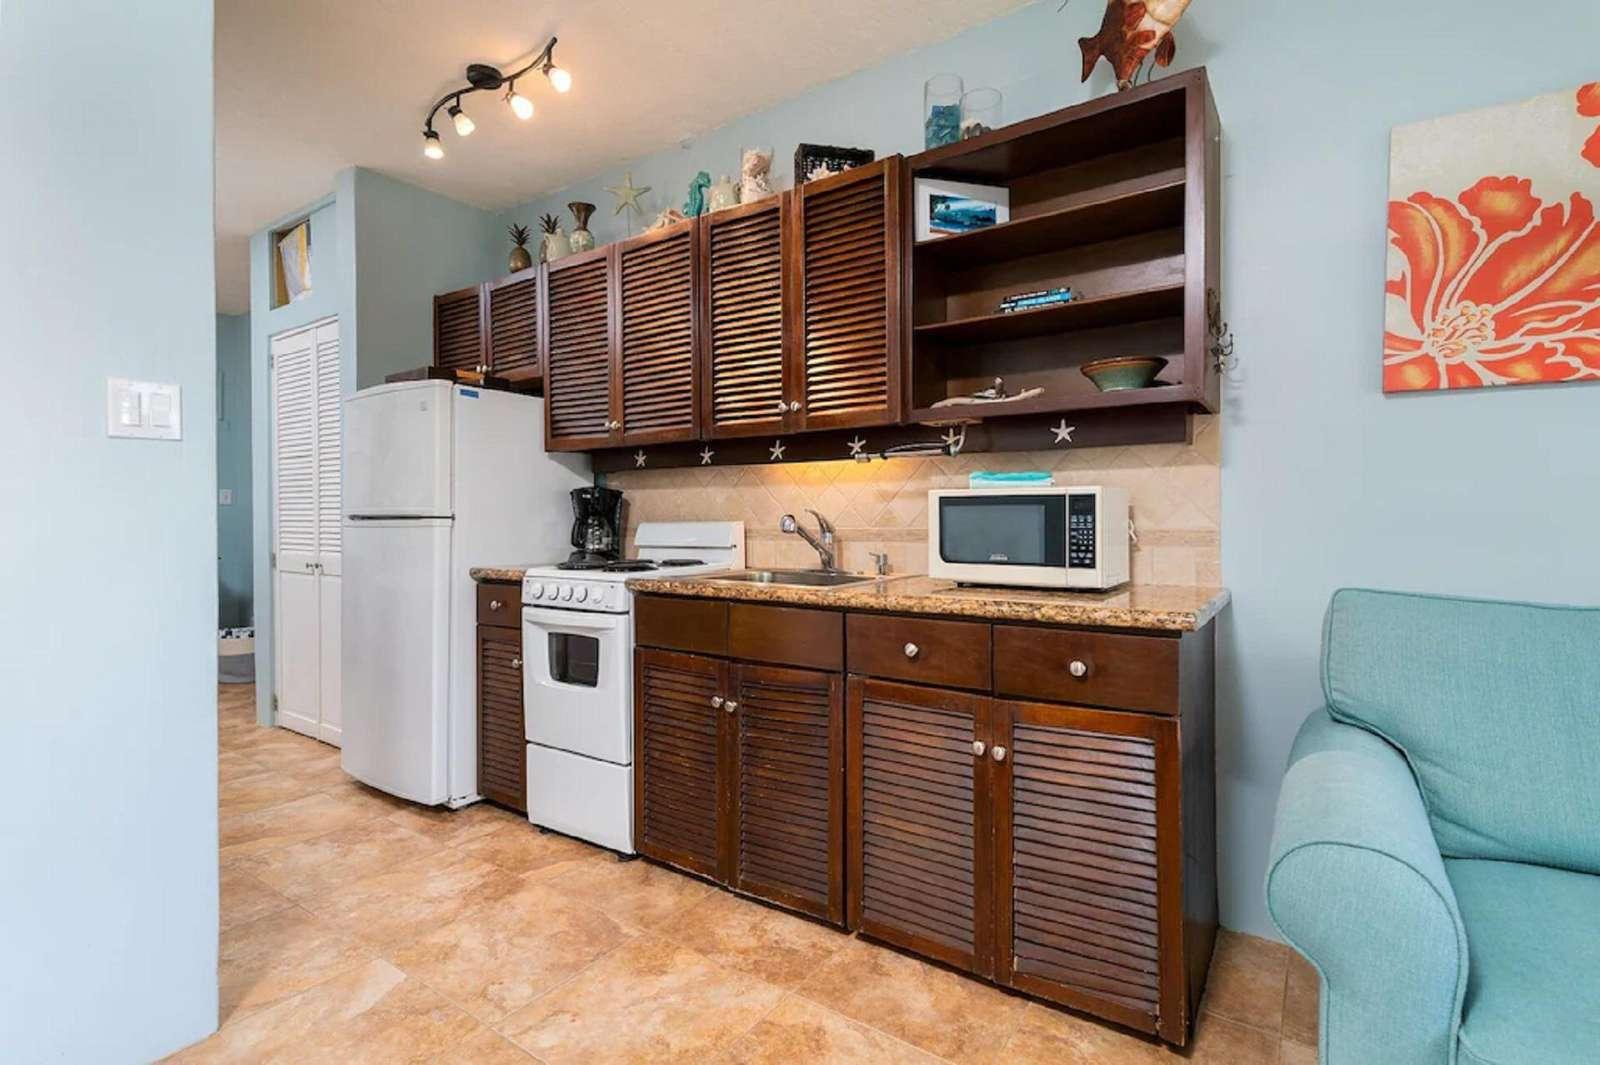 Mahogany Cabinets and Granite Counters